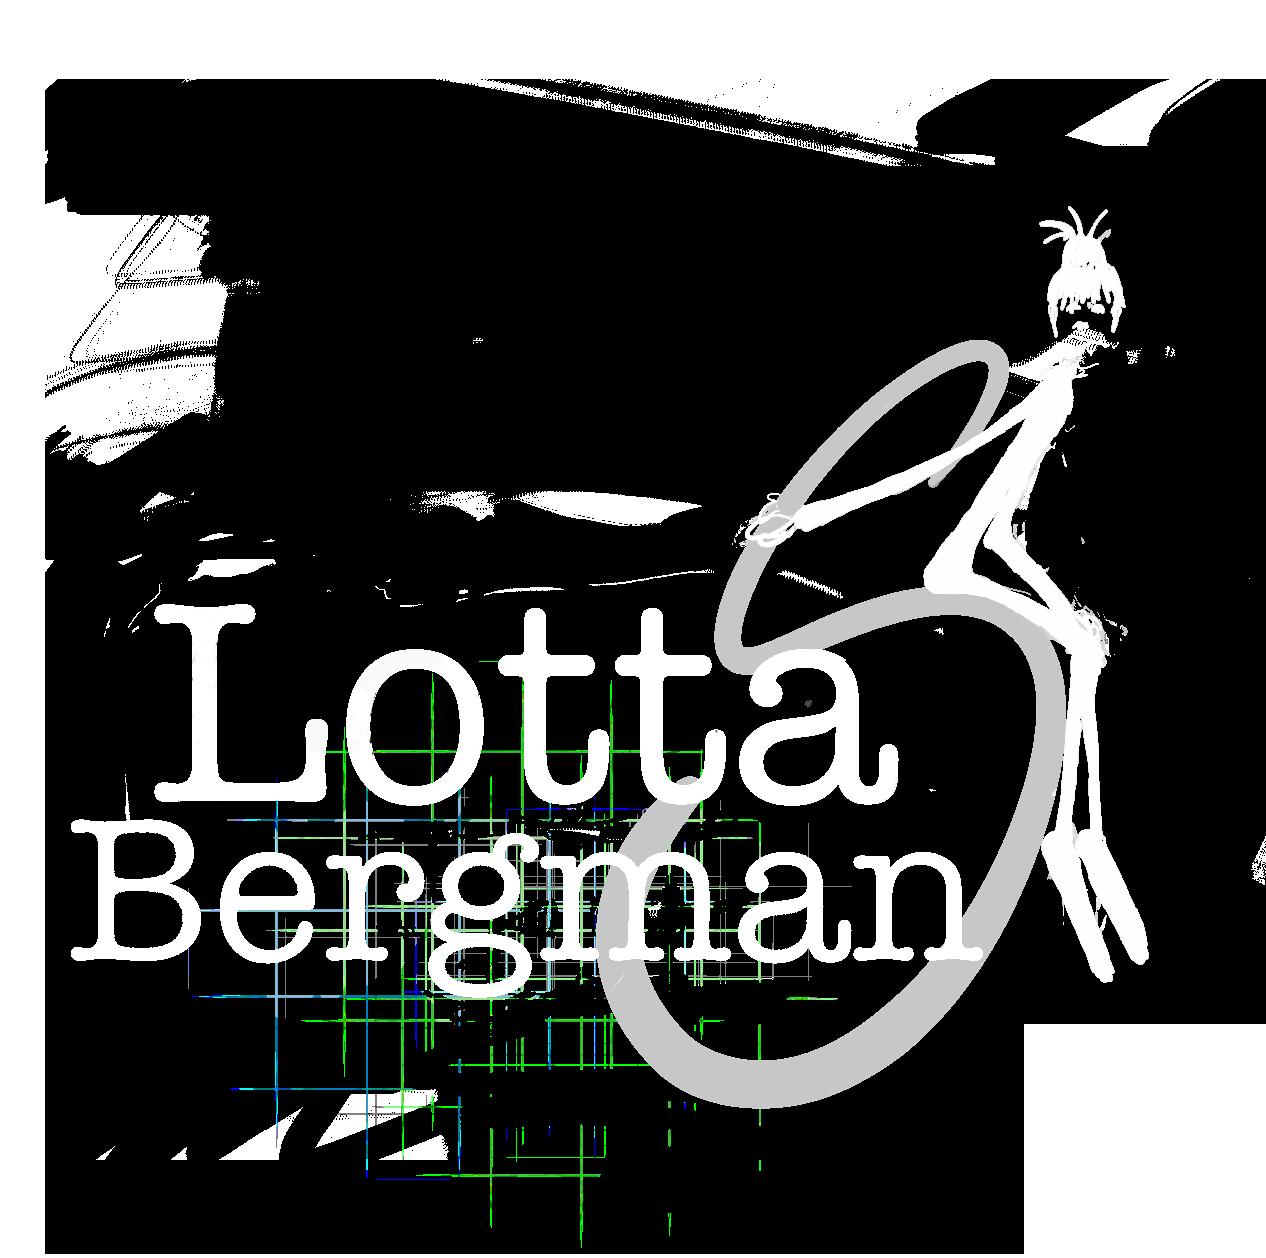 Lotta Bergman